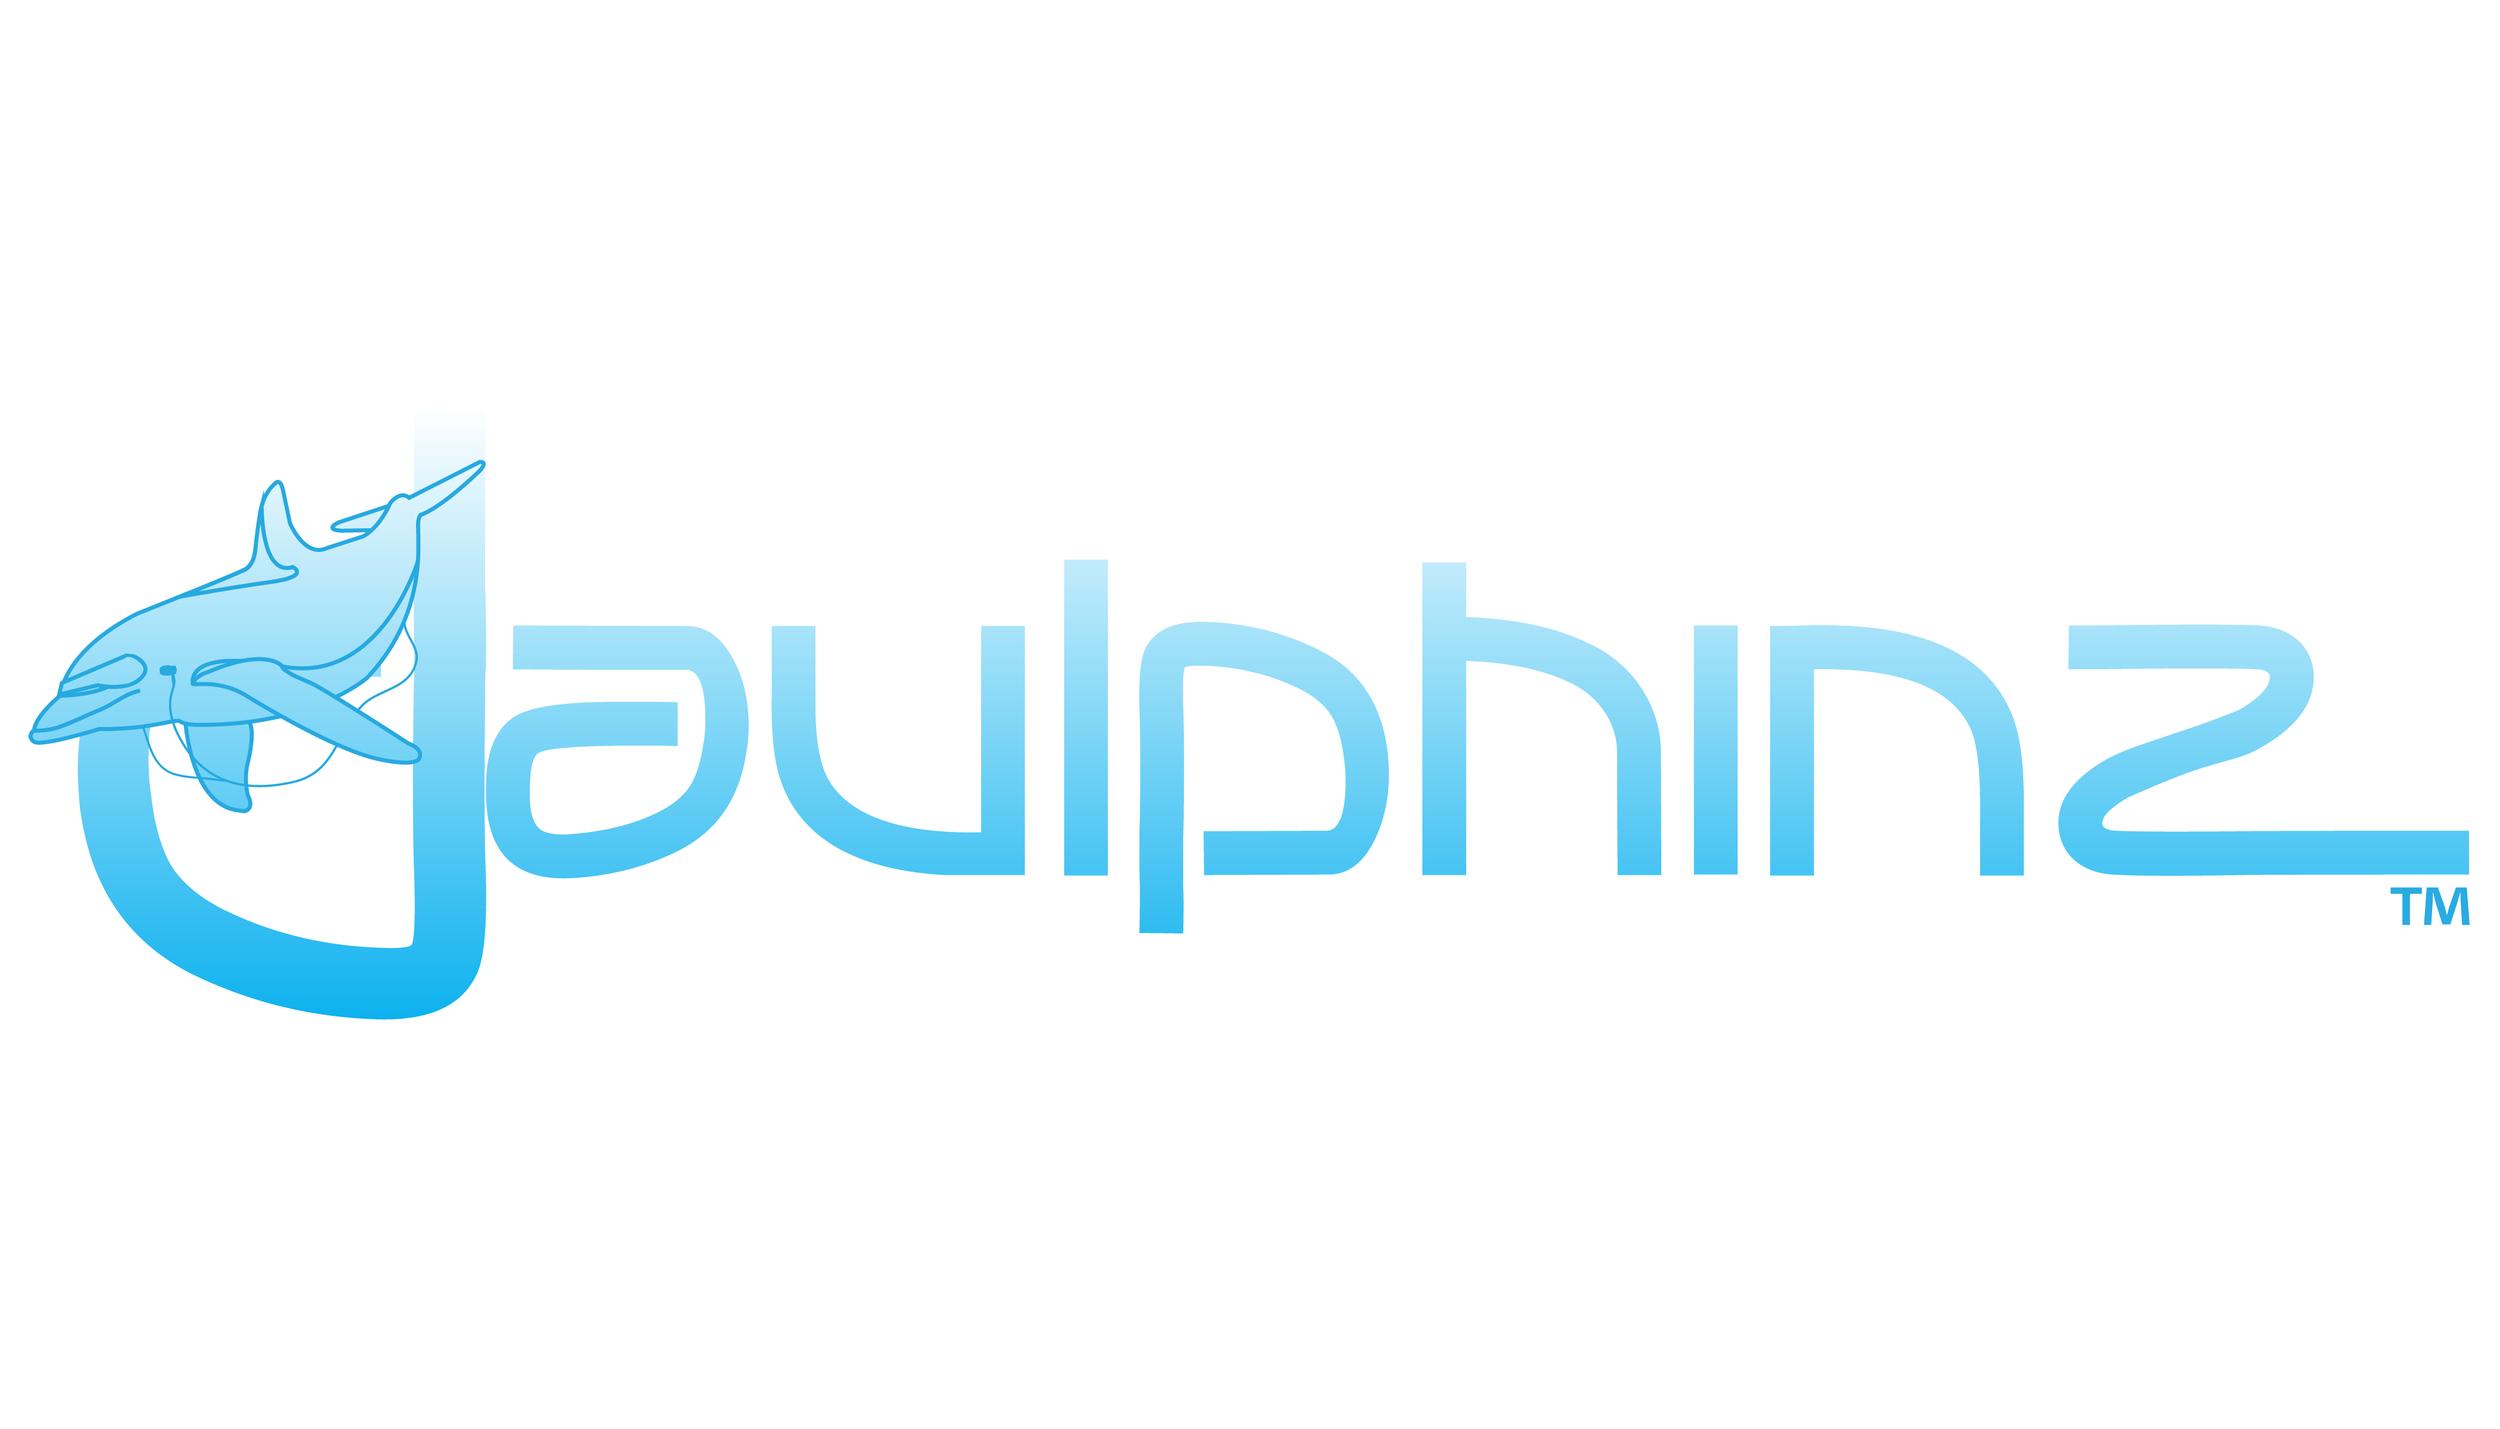 8x14-Daulphinz-01.jpg